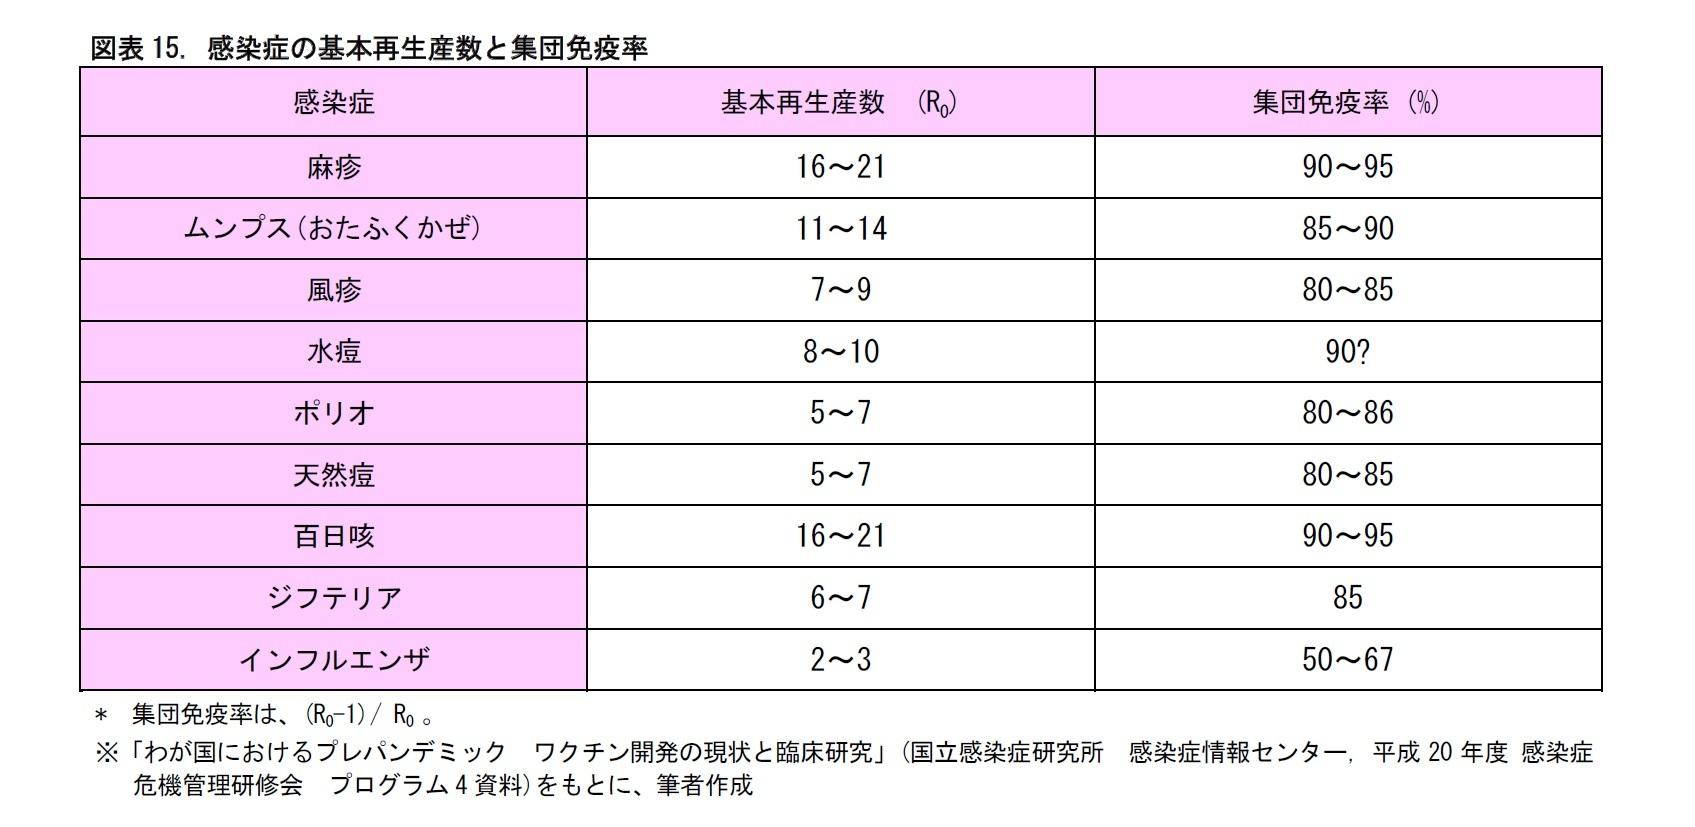 図表15. 感染症の基本再生産数と集団免疫率